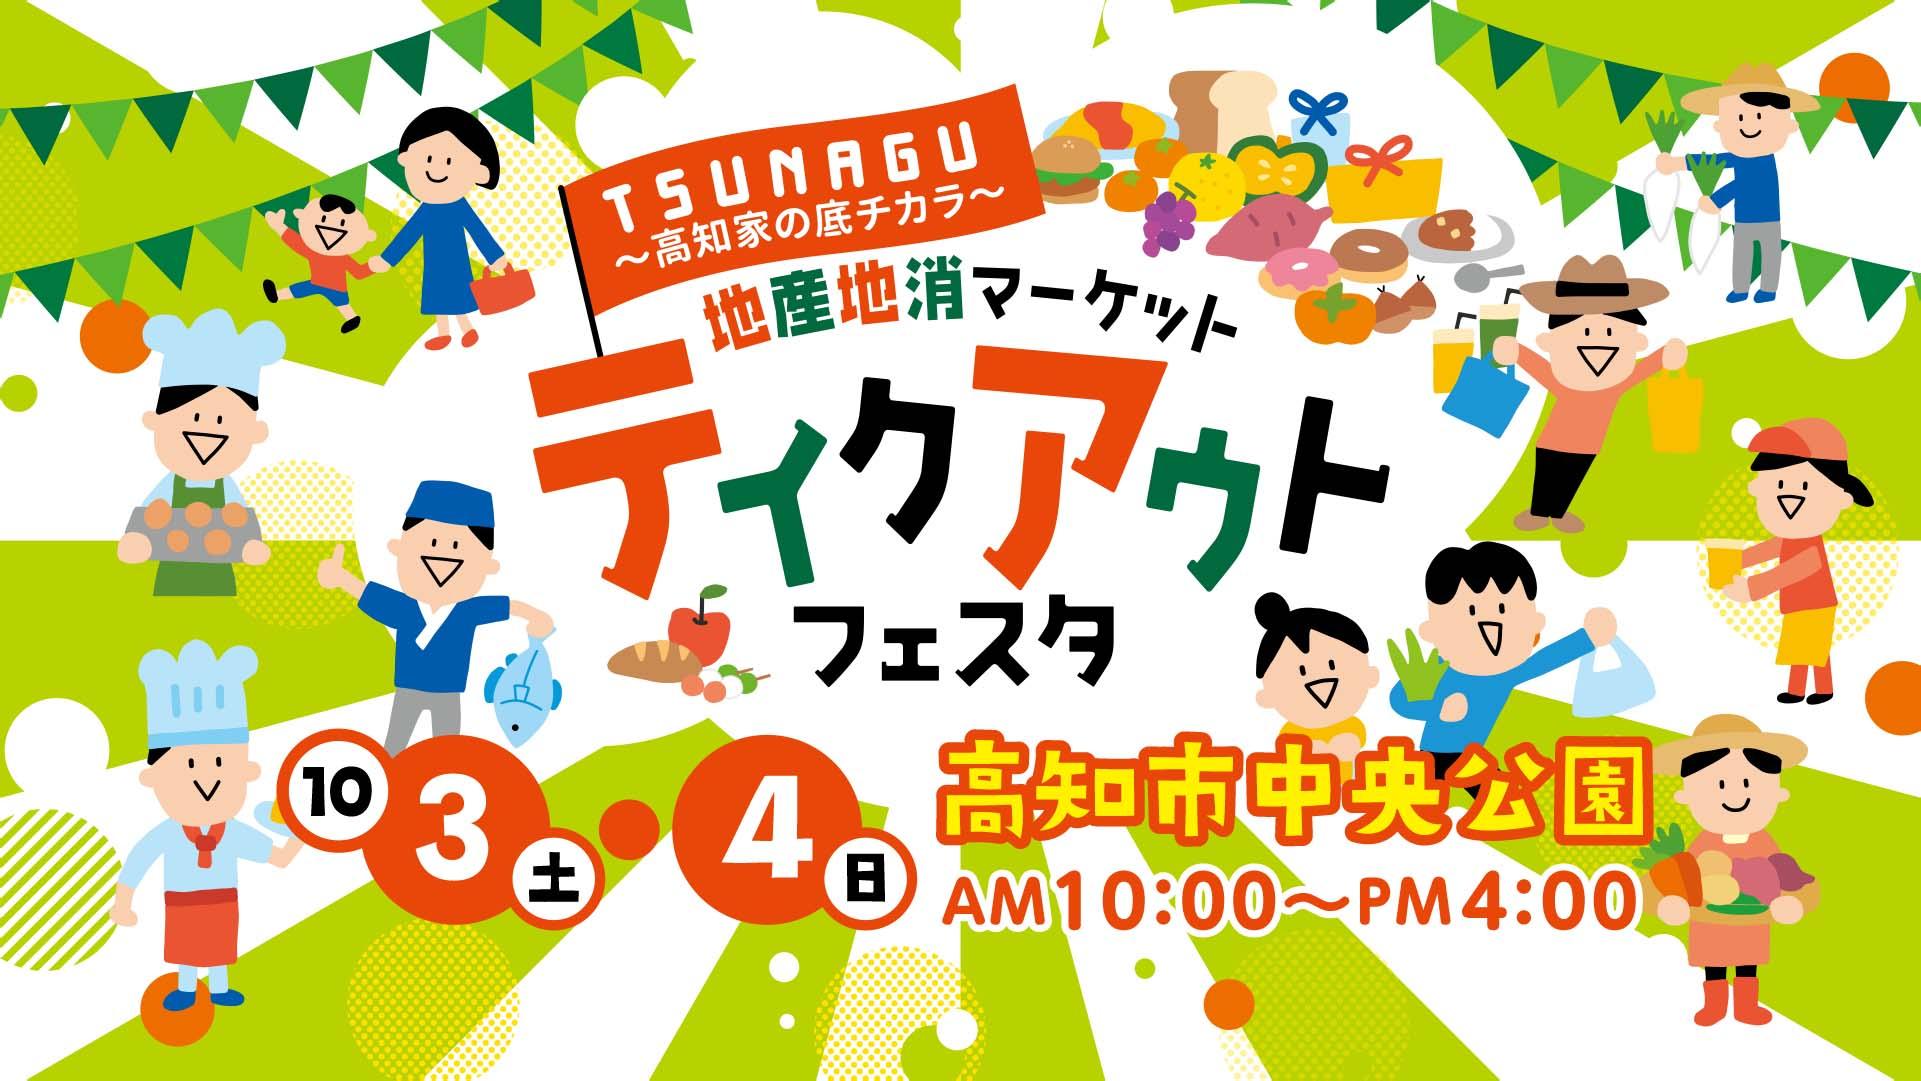 TSUNAGU~高知家の底チカラ~  地産地消マーケット「テイクアウトフェスタ」